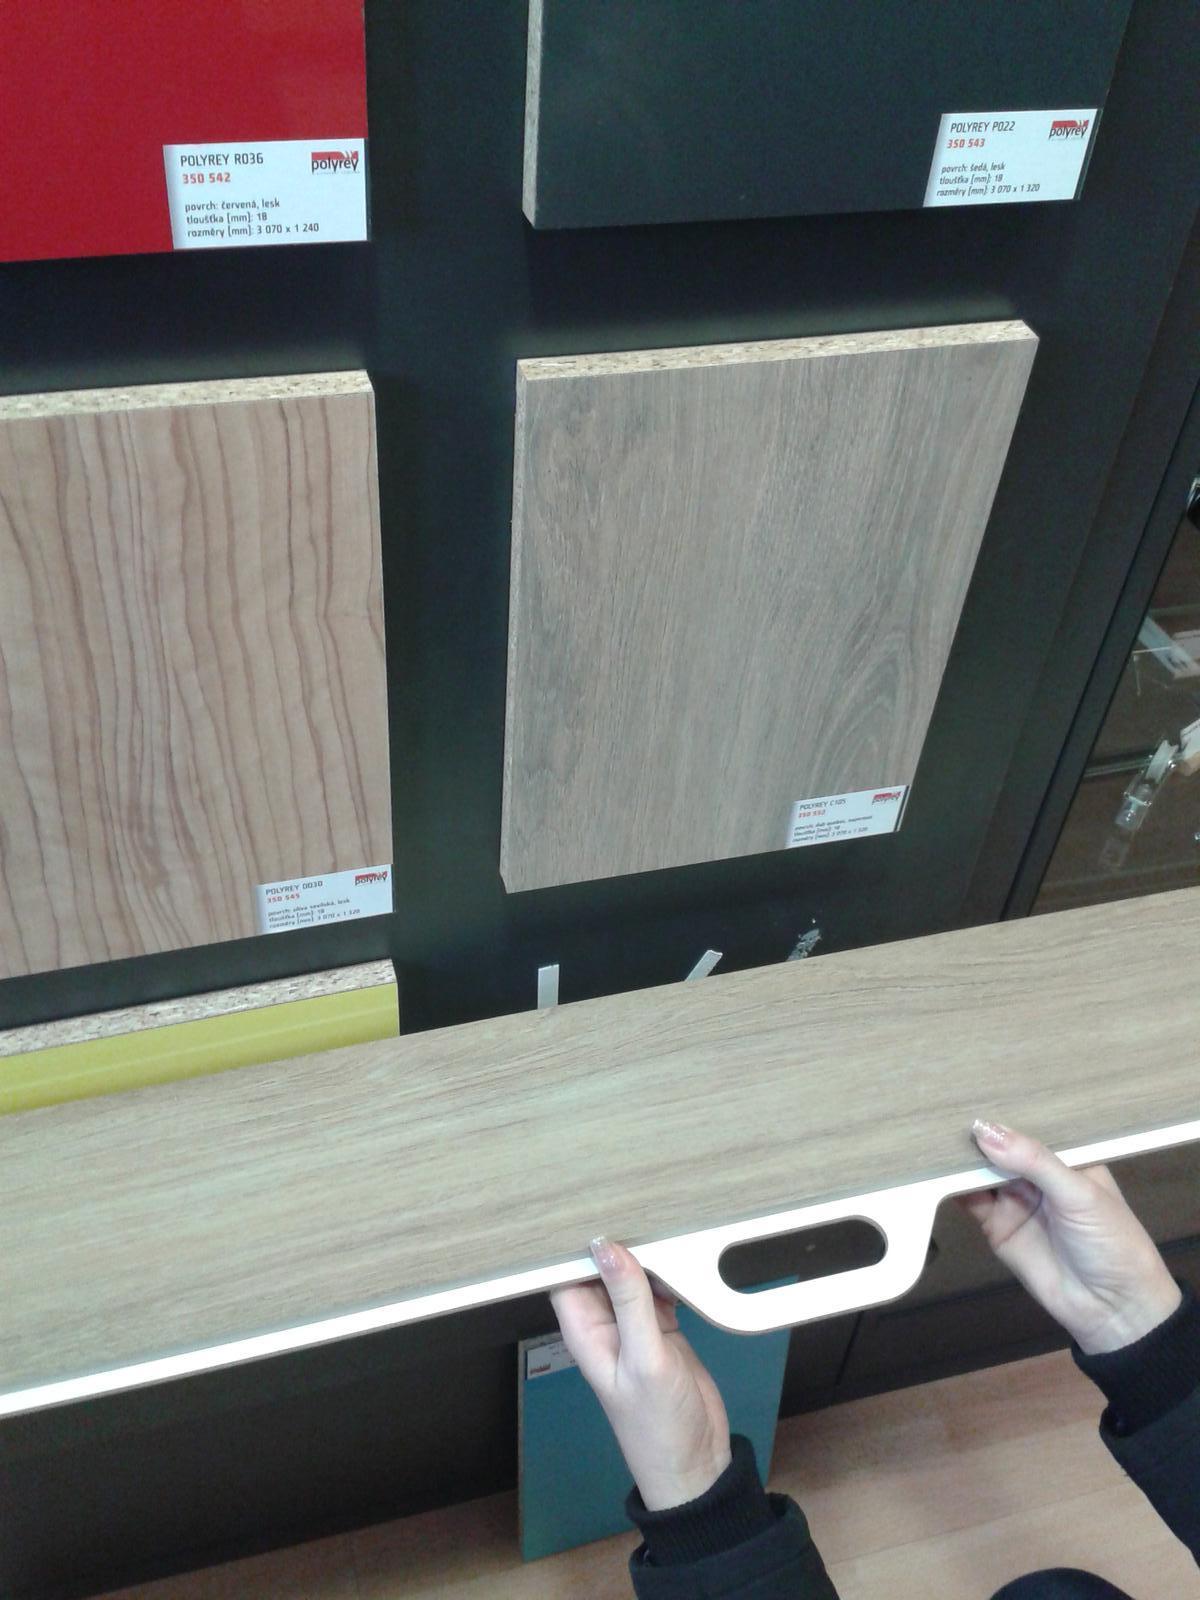 Mala panelakova koupelna - hledame odpovidajici lamino k dlazbe